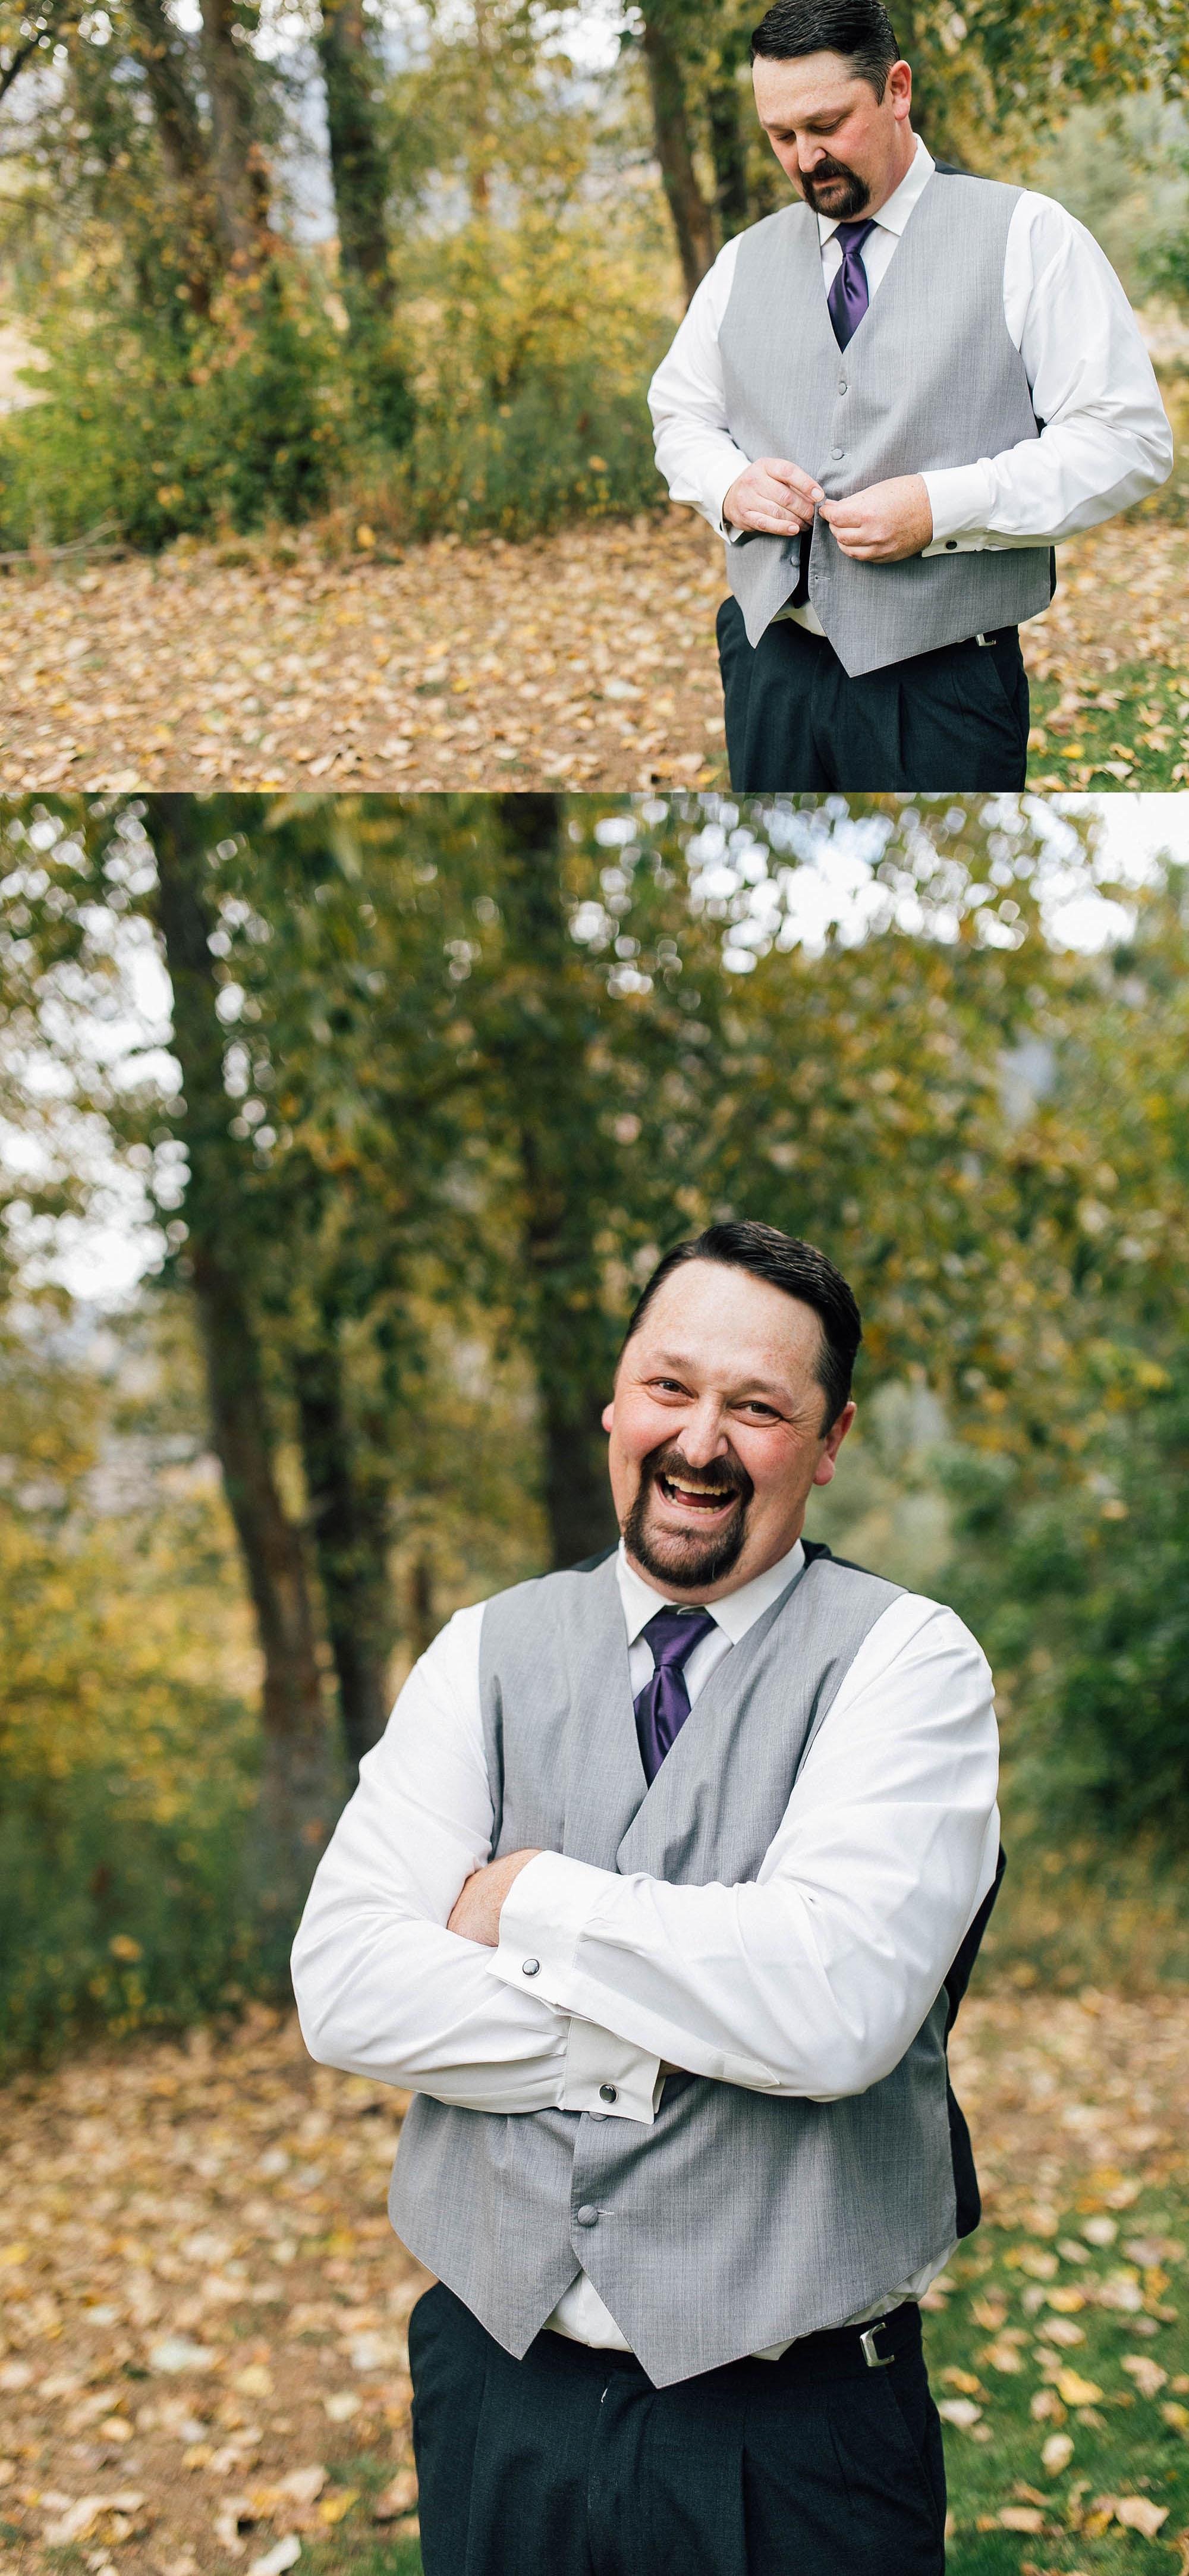 ashley_vos_seattle_ wedding_photographer_0225.jpg